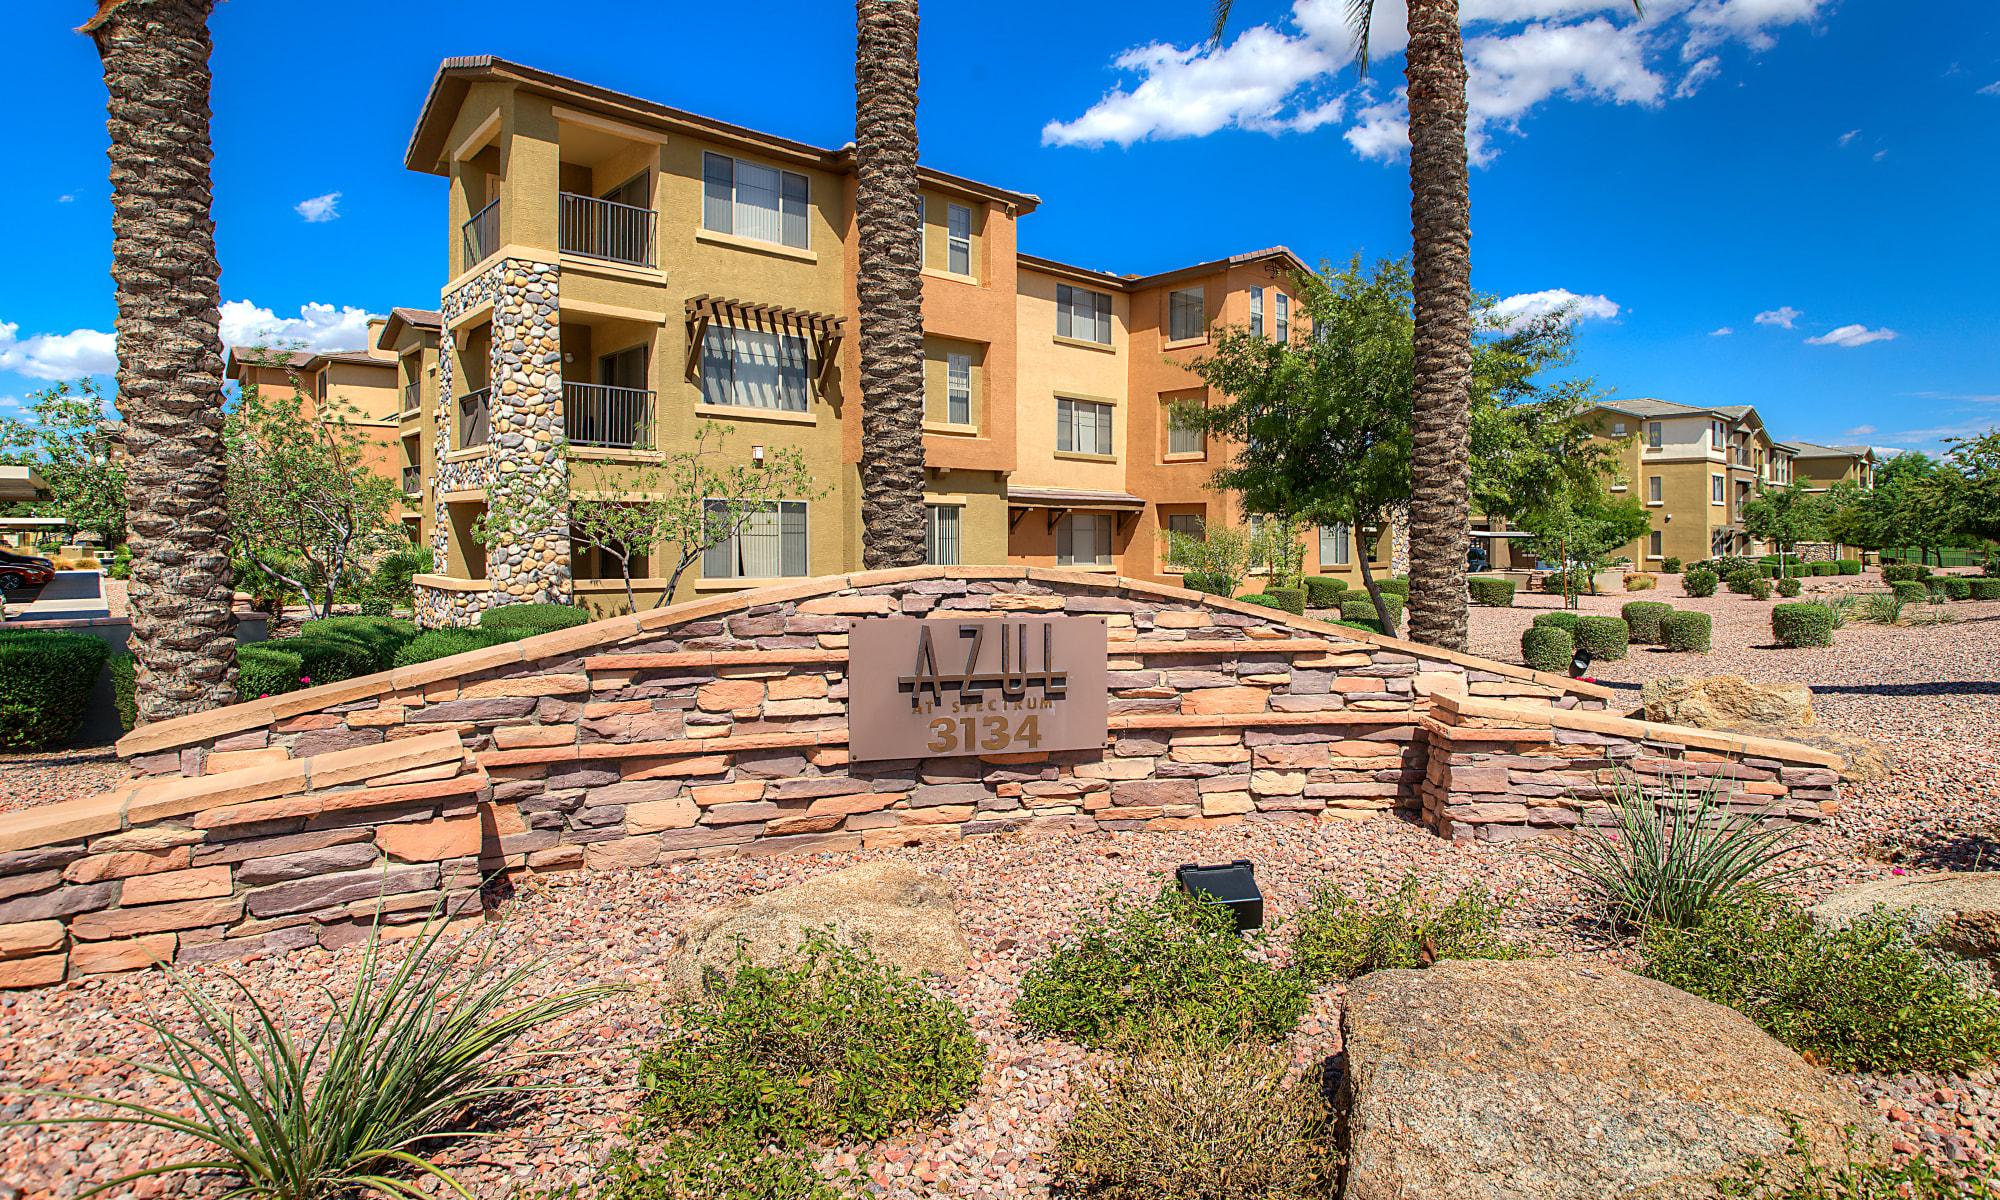 Apartments at Azul at Spectrum in Gilbert, Arizona